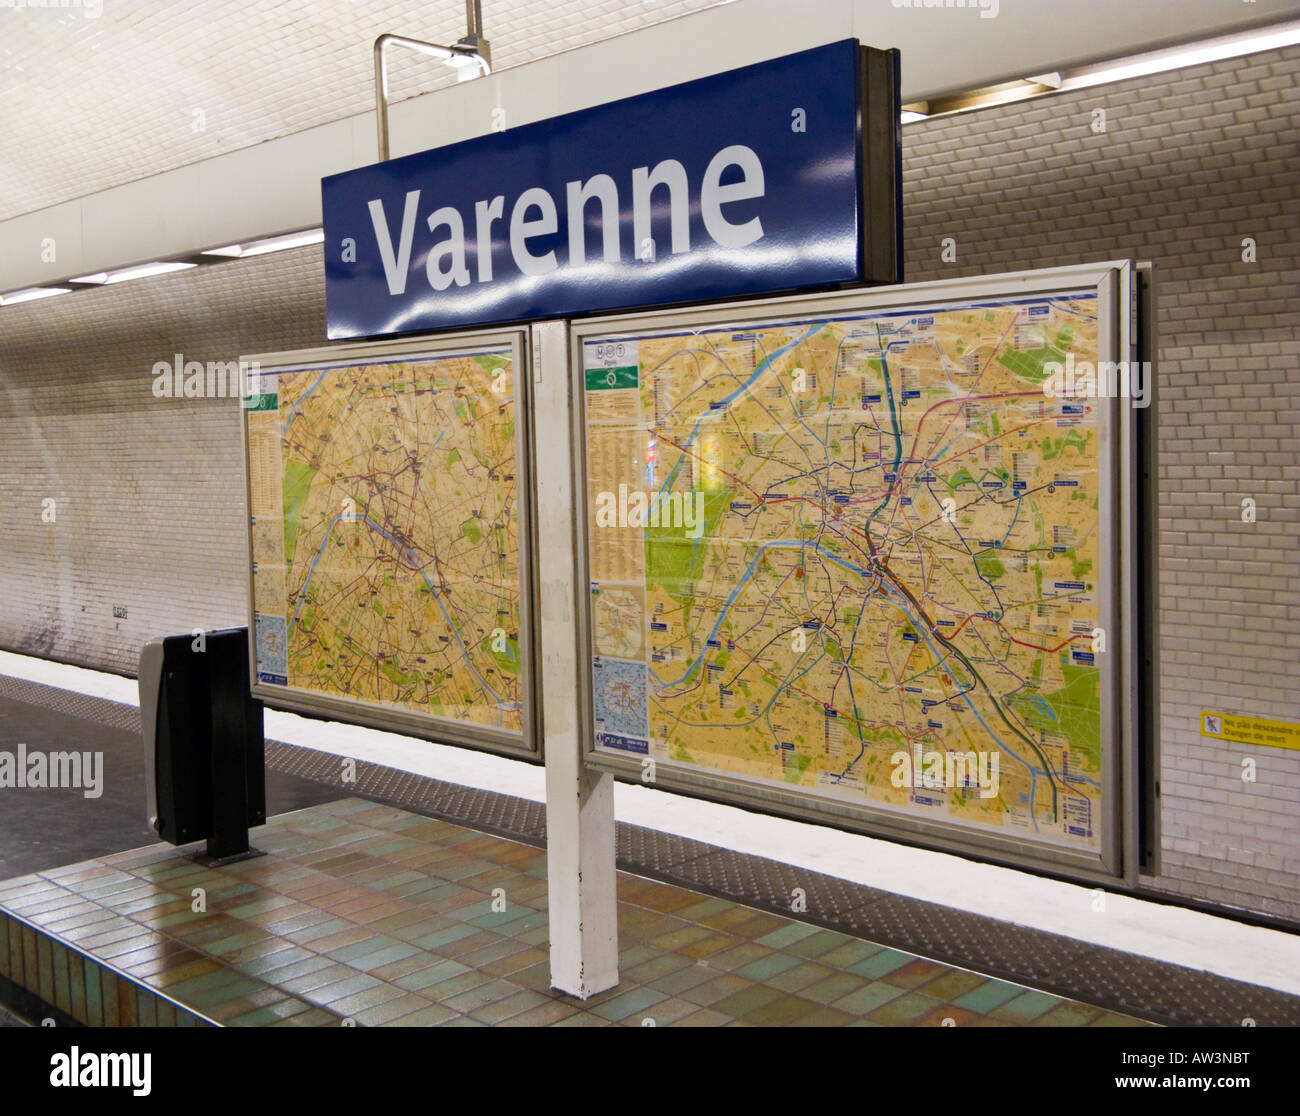 Subway Map Sign.Paris Metro Station Sign And Map On The Subway Platform At Varenne